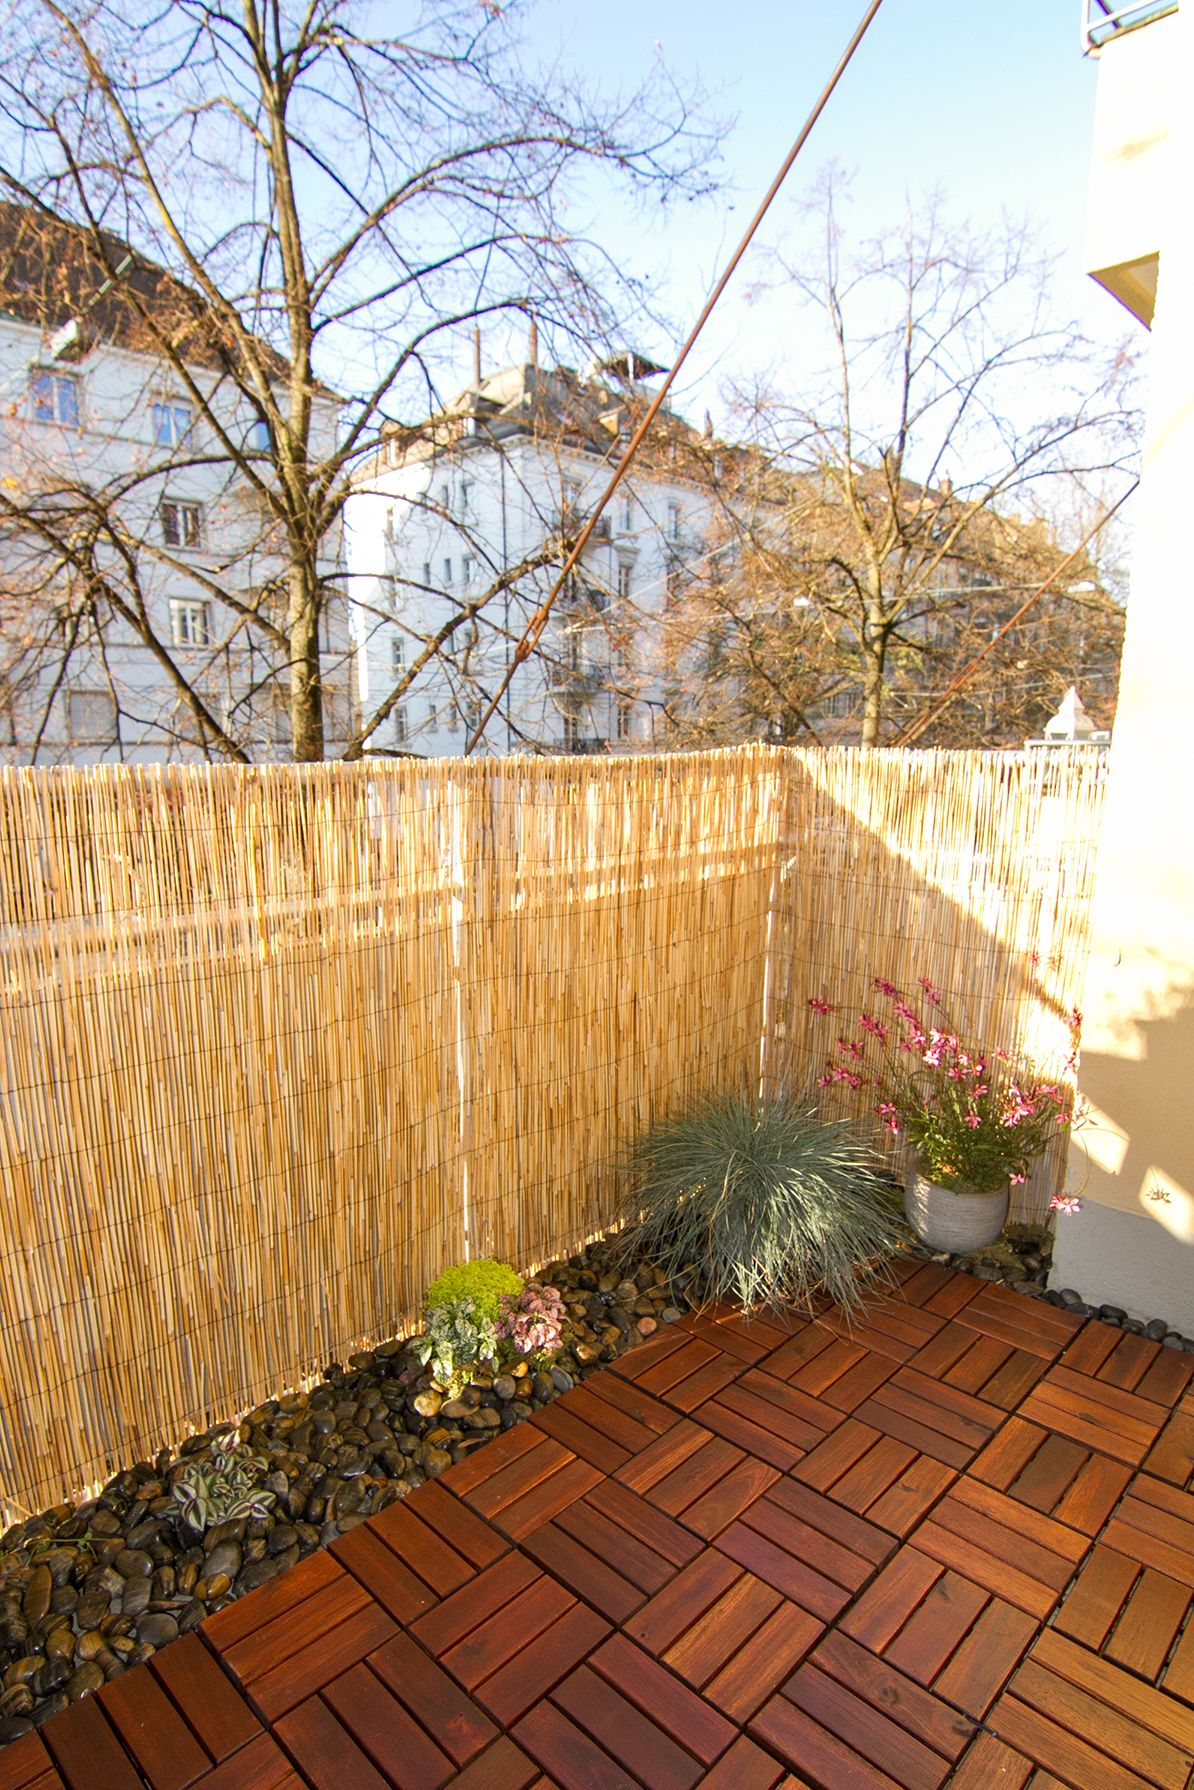 Balcony Diy In Progress Little Garden With Black And Terra